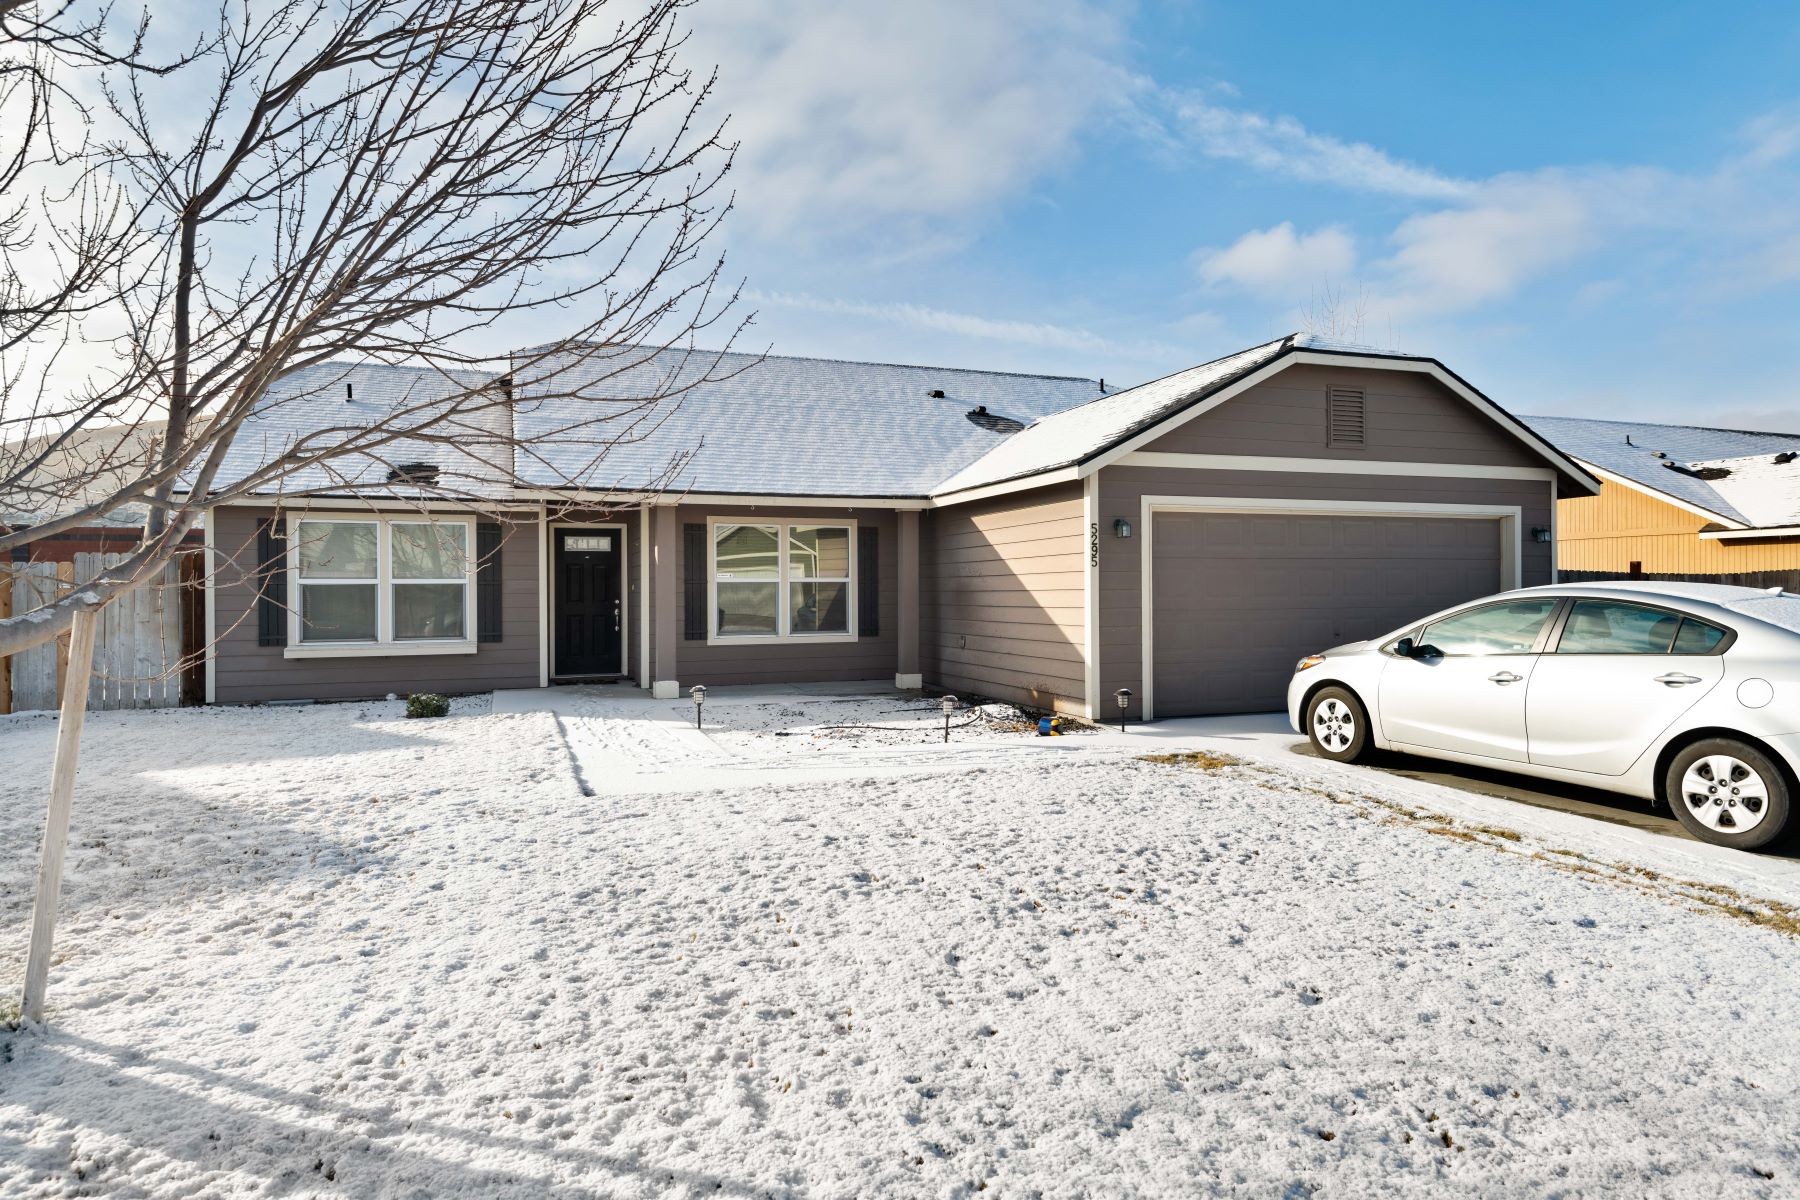 Single Family Homes for Sale at 3 Bed Plus Office 5295 Pinehurst Street West Richland, Washington 99353 United States